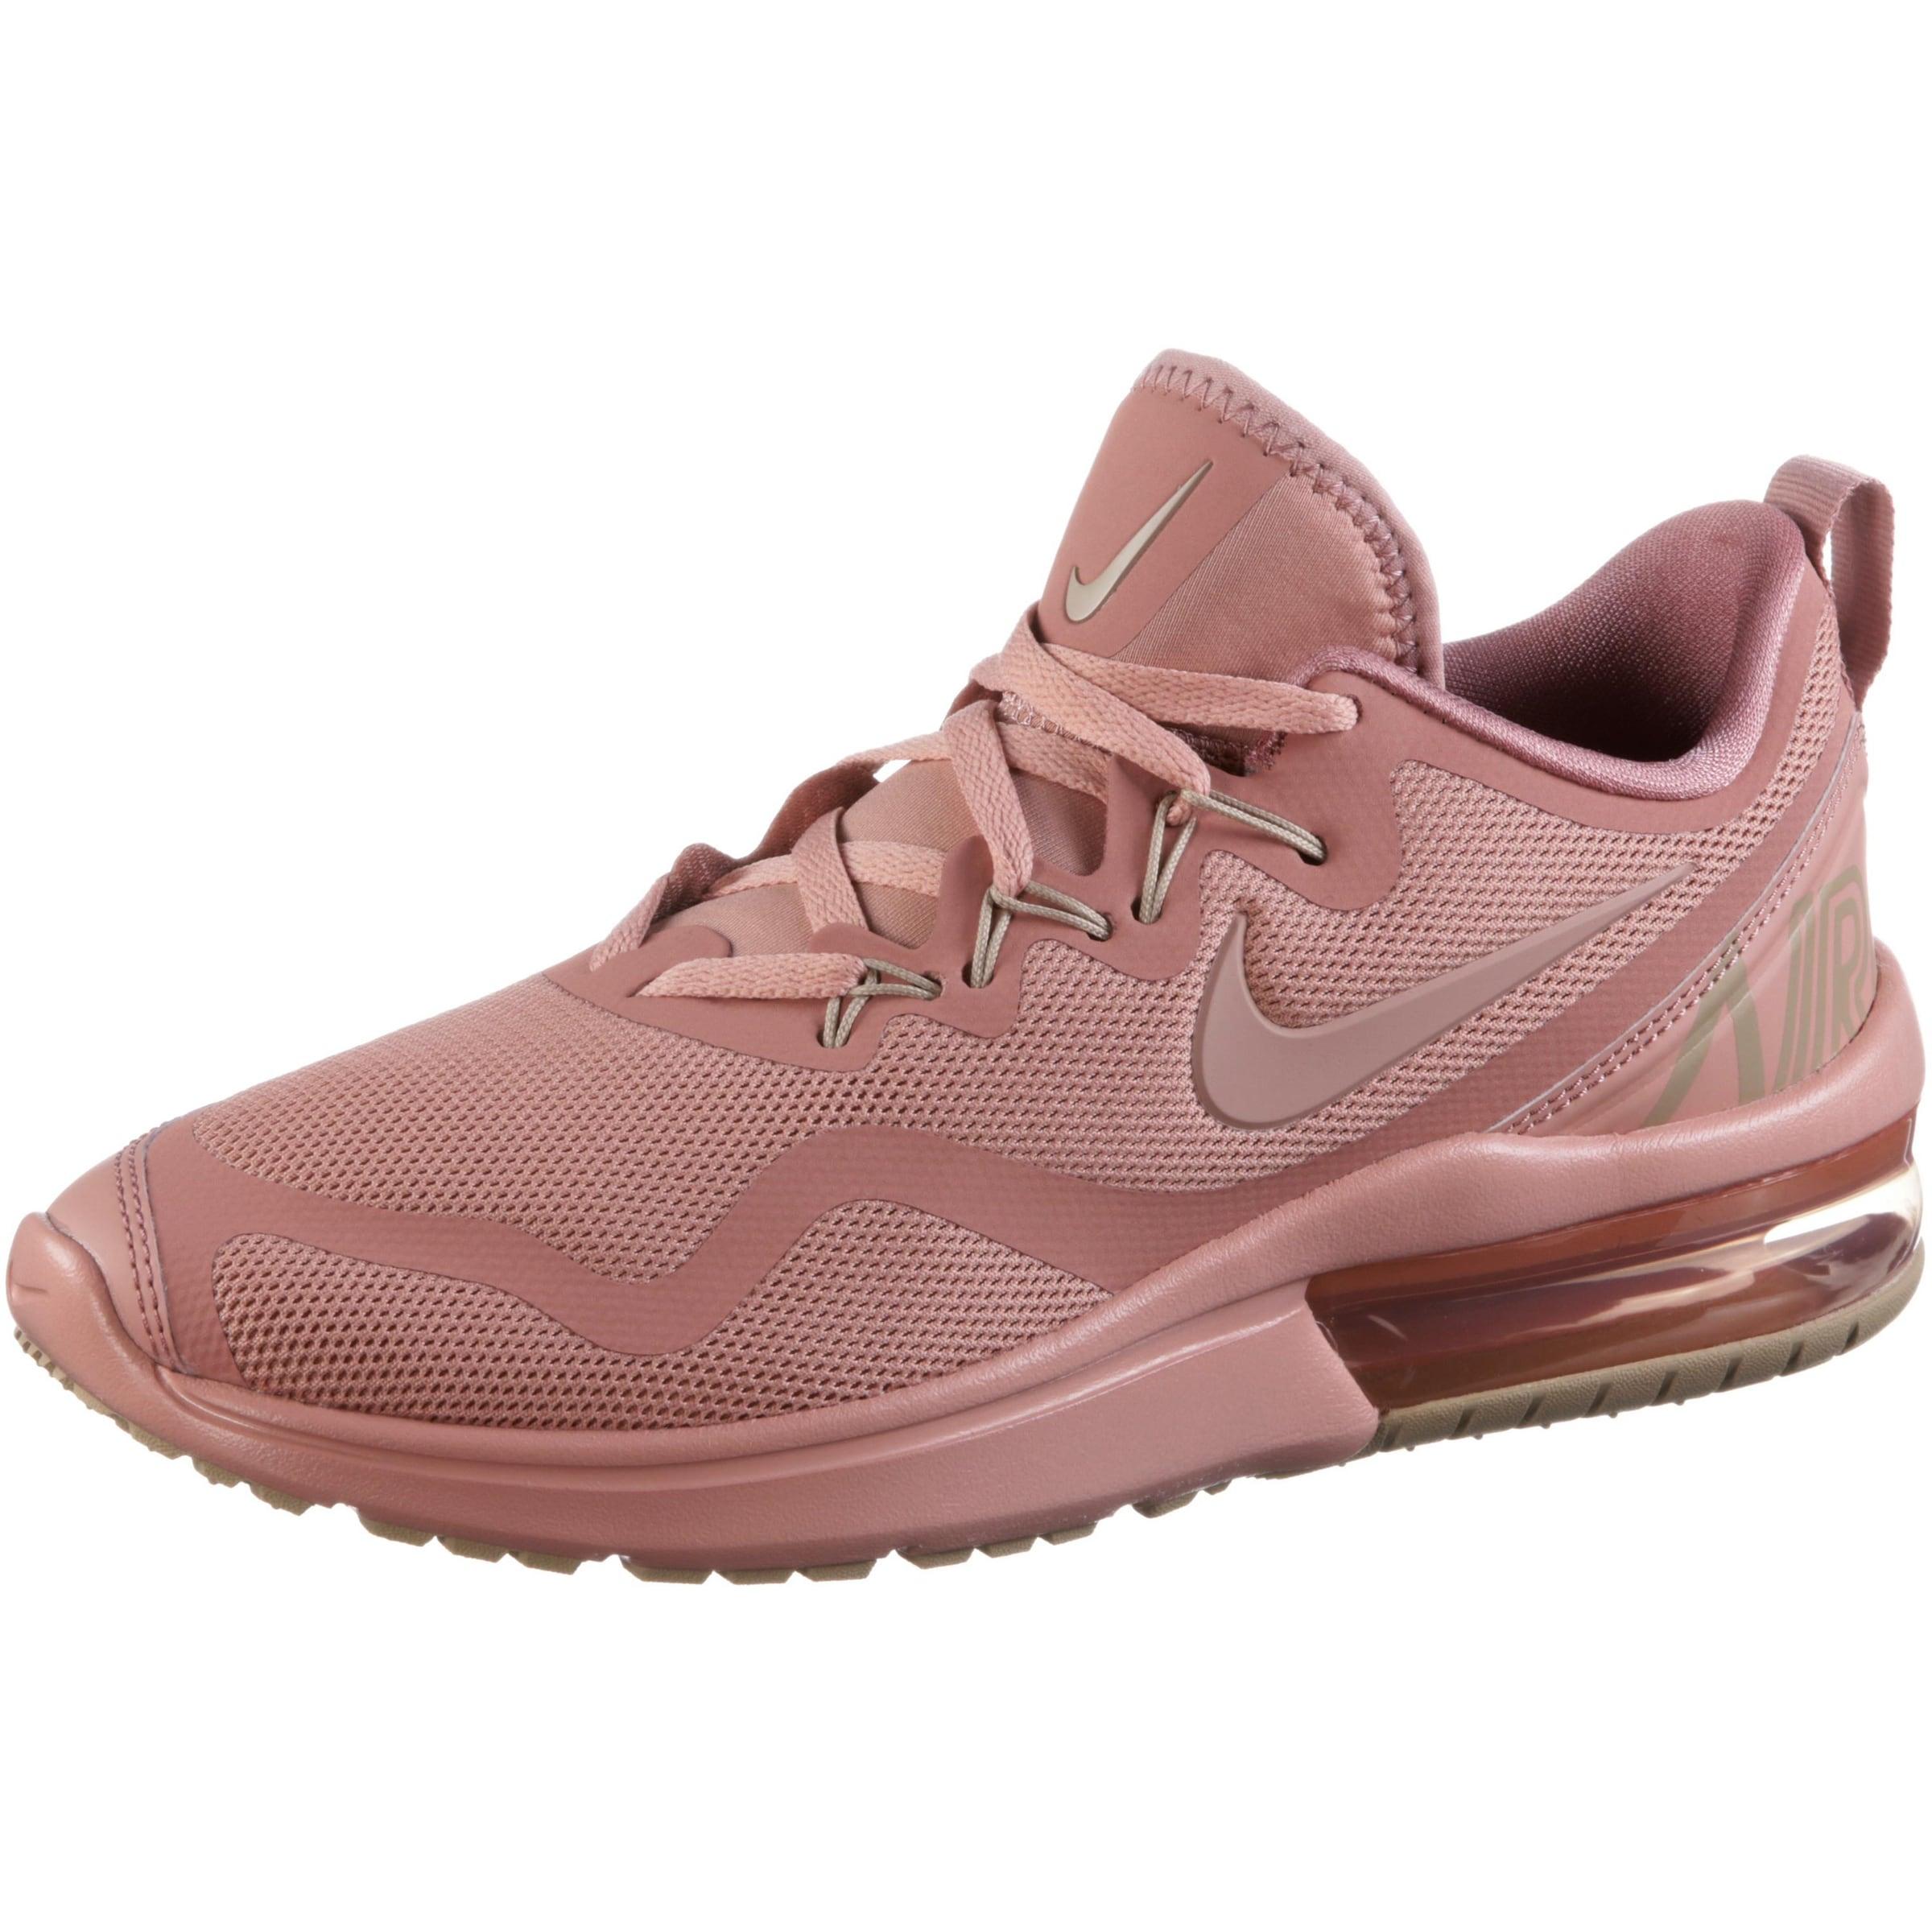 Nike Chaussures De Sport Laag 'fureur Air Max' Oudroze xLSQz